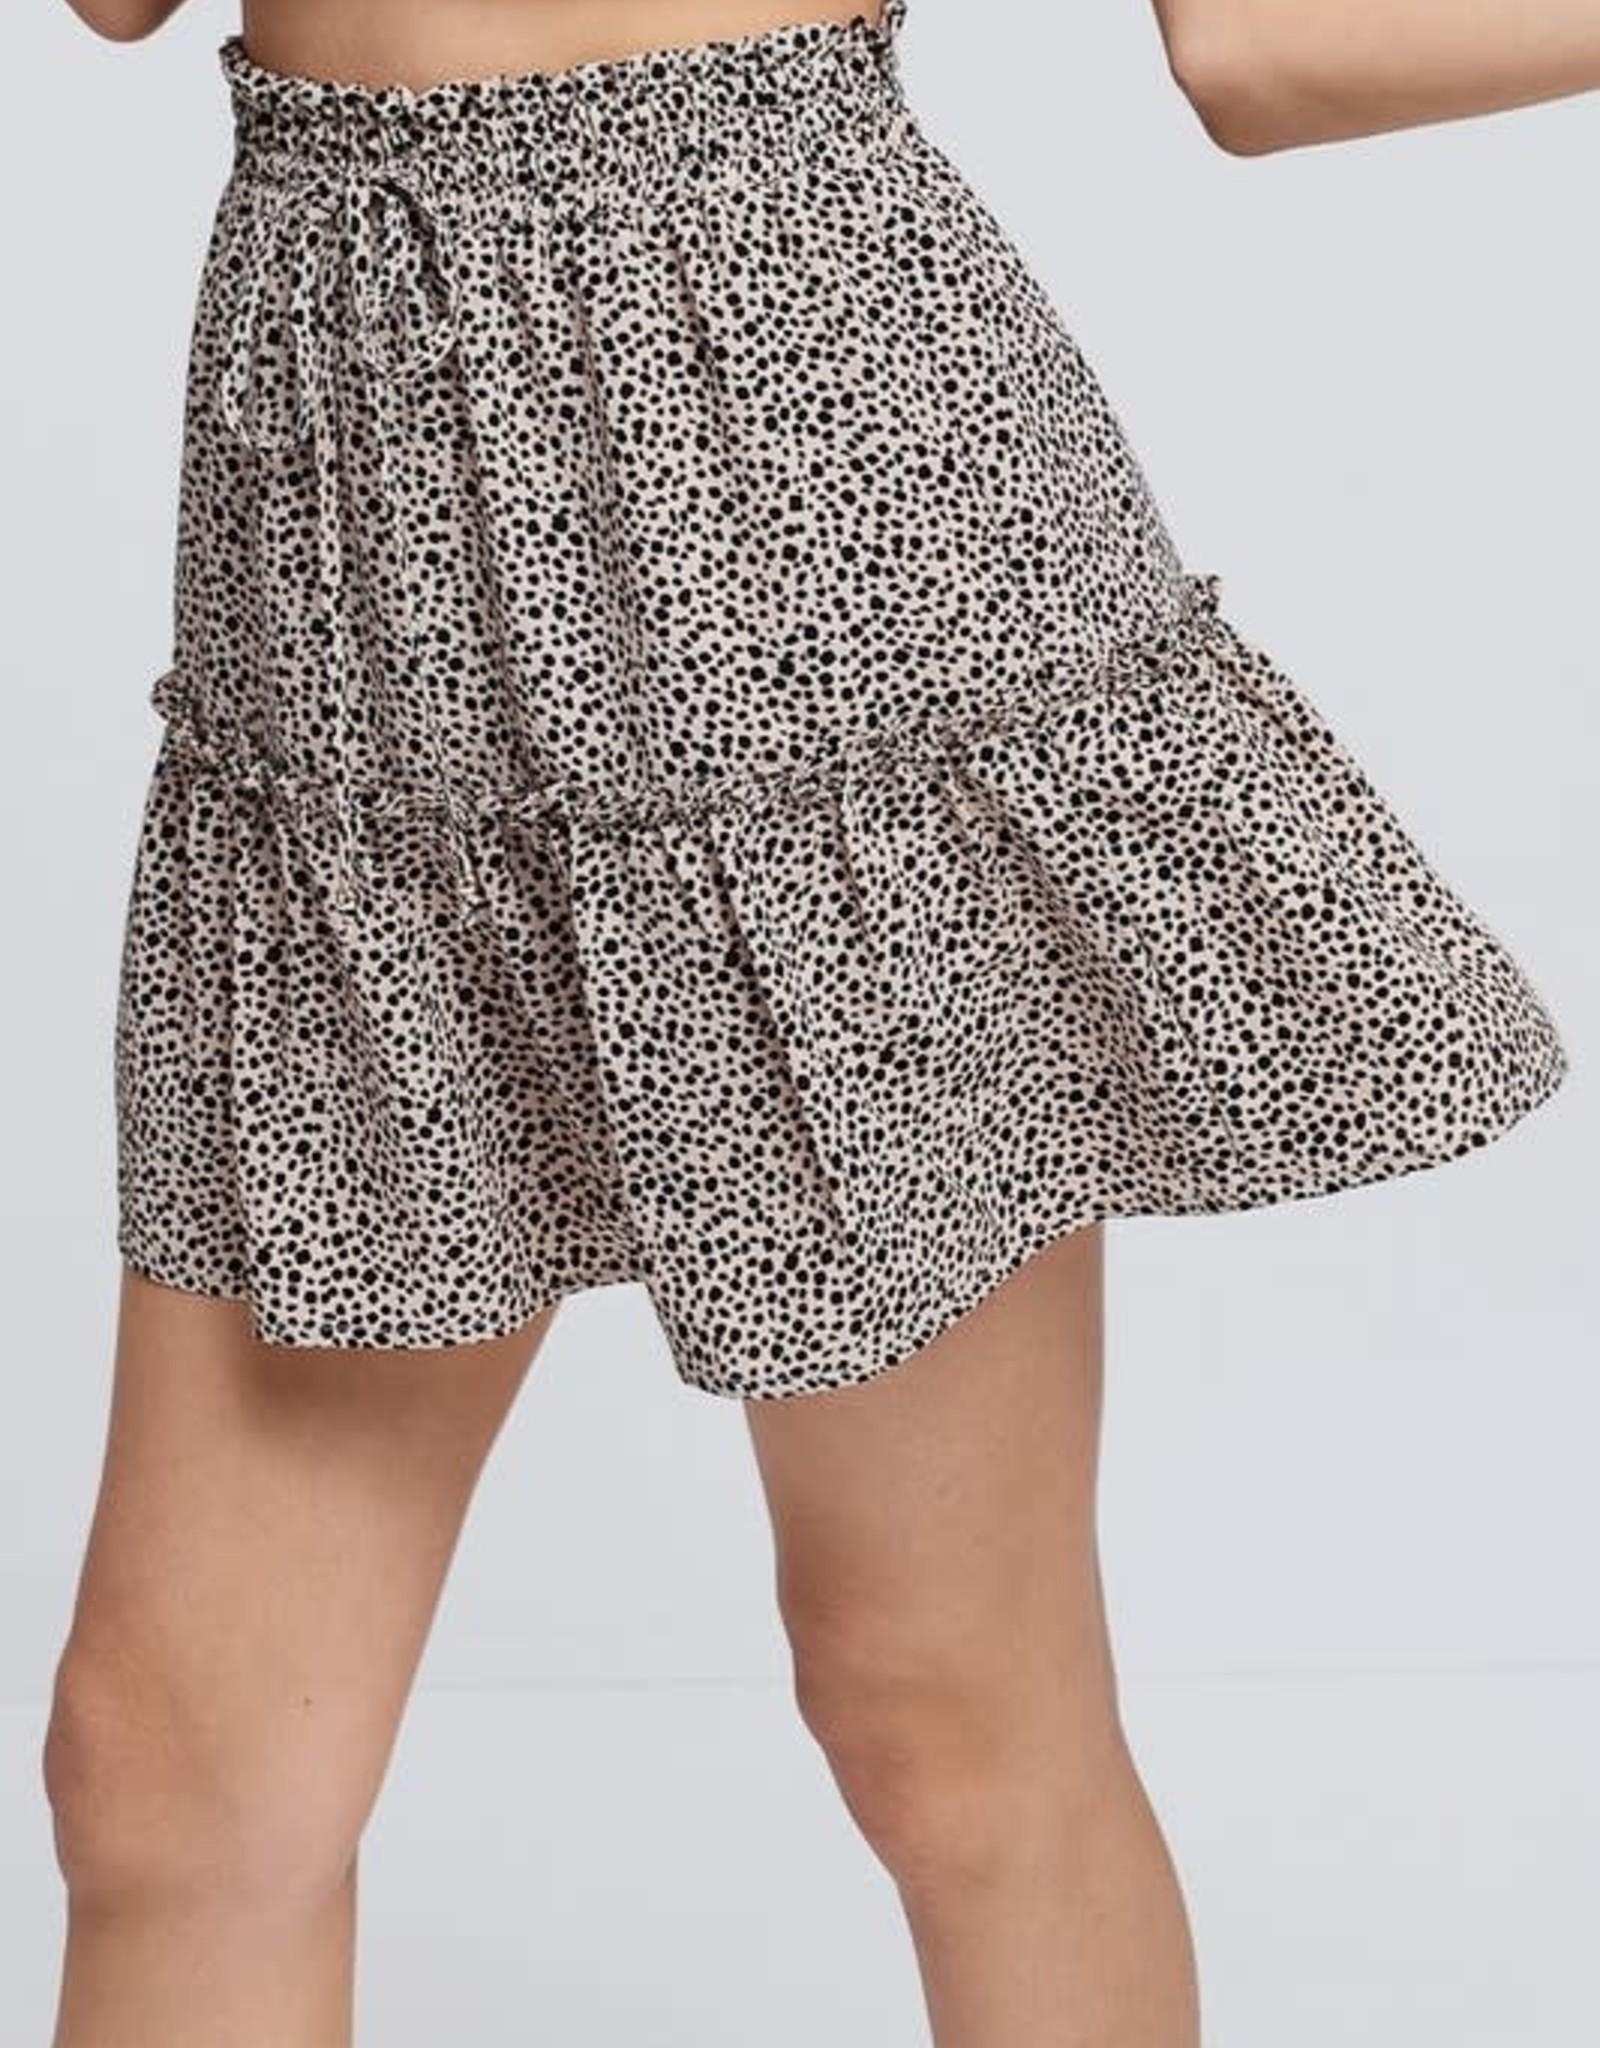 Oleanders Boutique Mocha animal print skirt